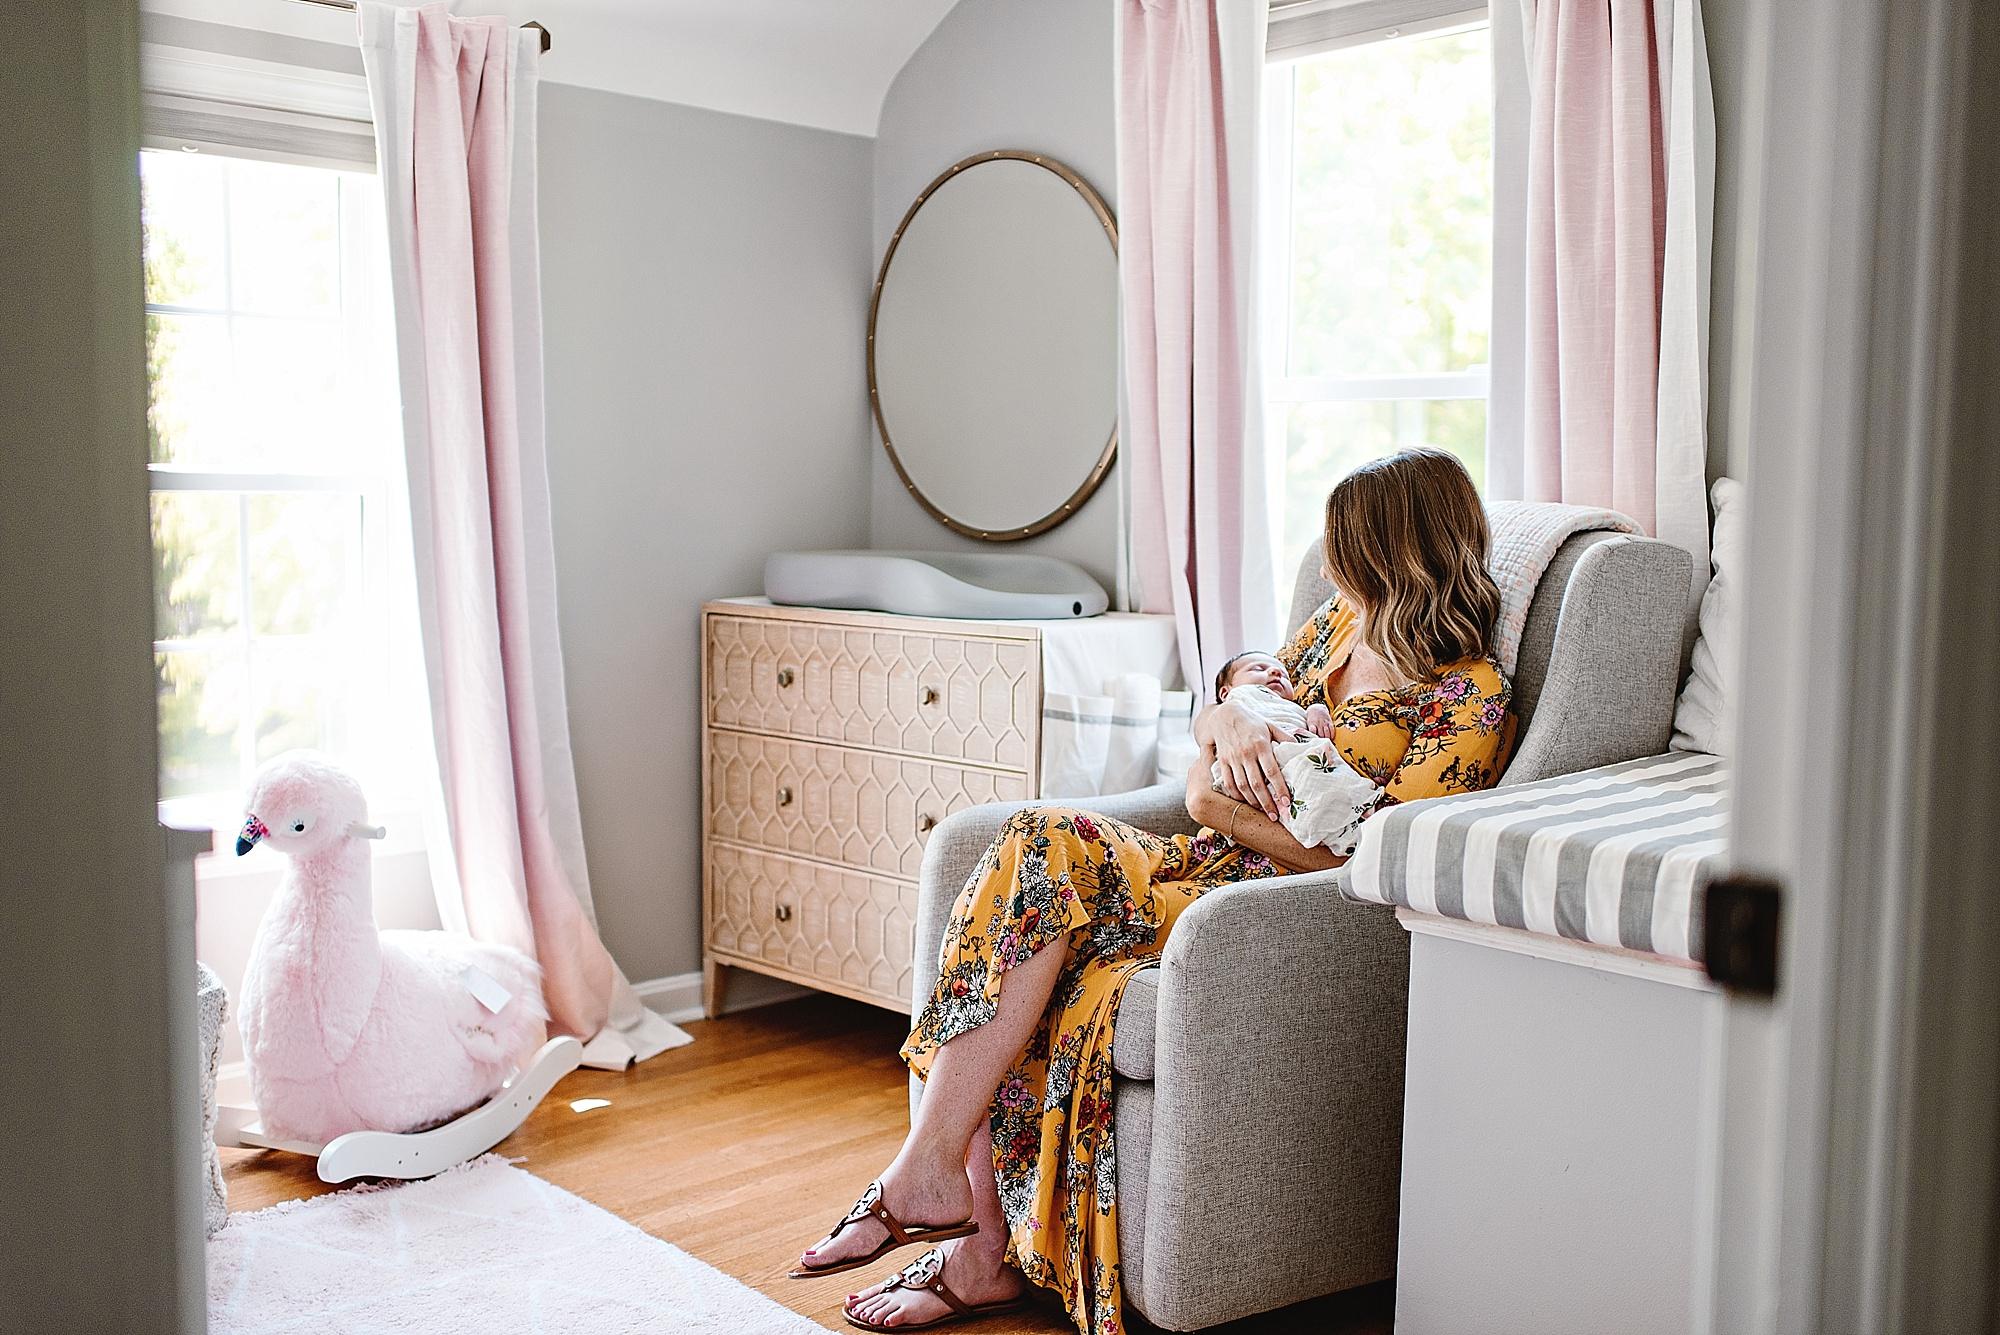 lauren-grayson-photography-cleveland-ohio-photographer-newborn-session-in-home-lifestyle-newborn-family-vivian_0652.jpg